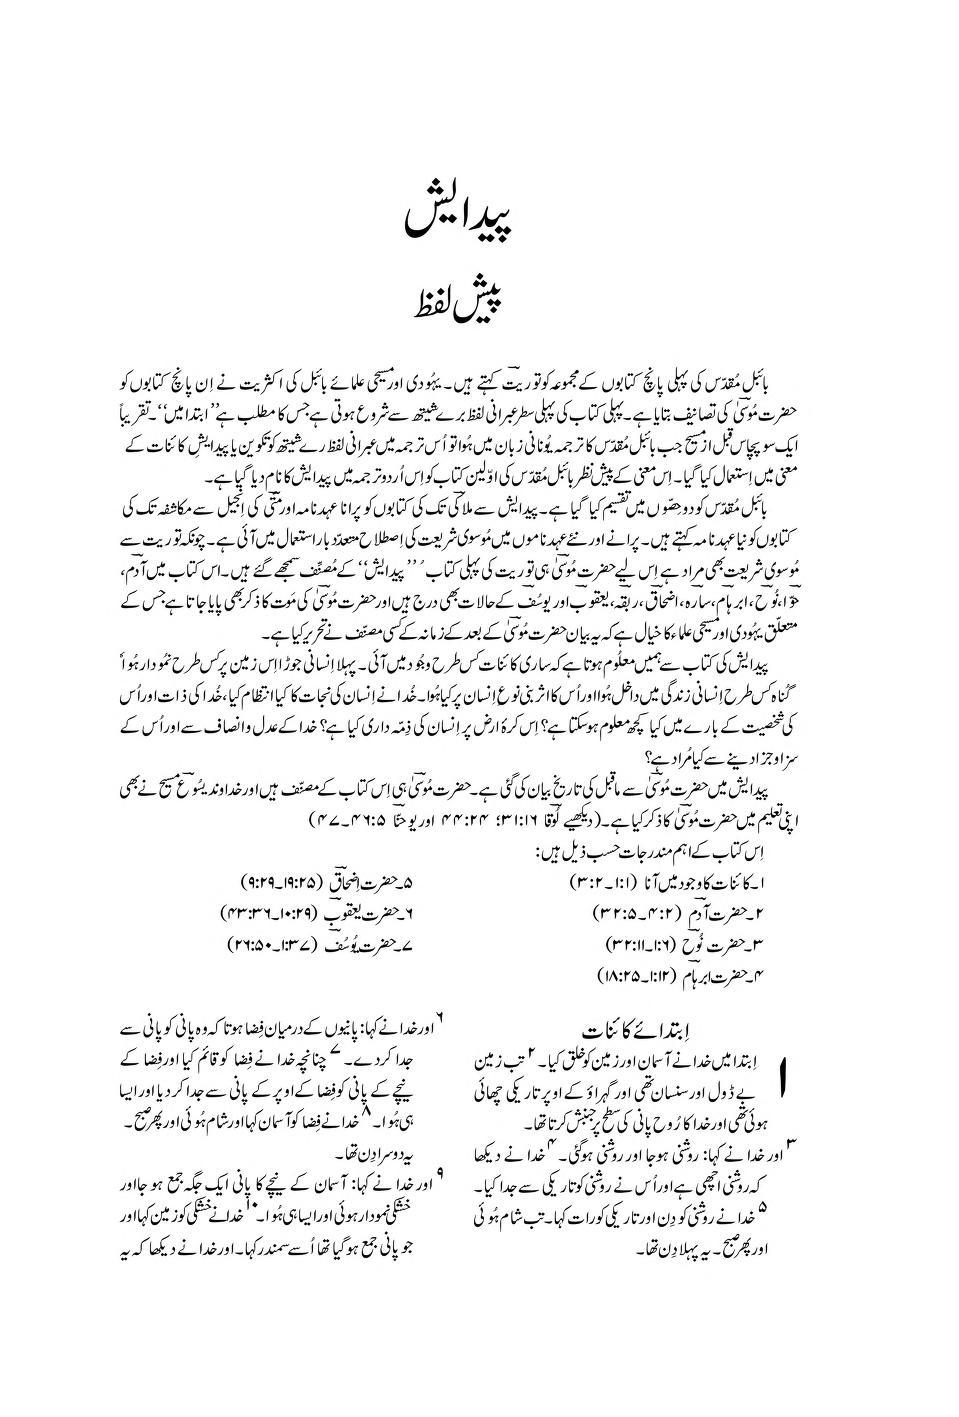 Bible Urdu Old Testament . کتب ۔ مسیحی کتب ۔ بائبل پرانا عہد نامہ ۔ انجیل ۔ اردو